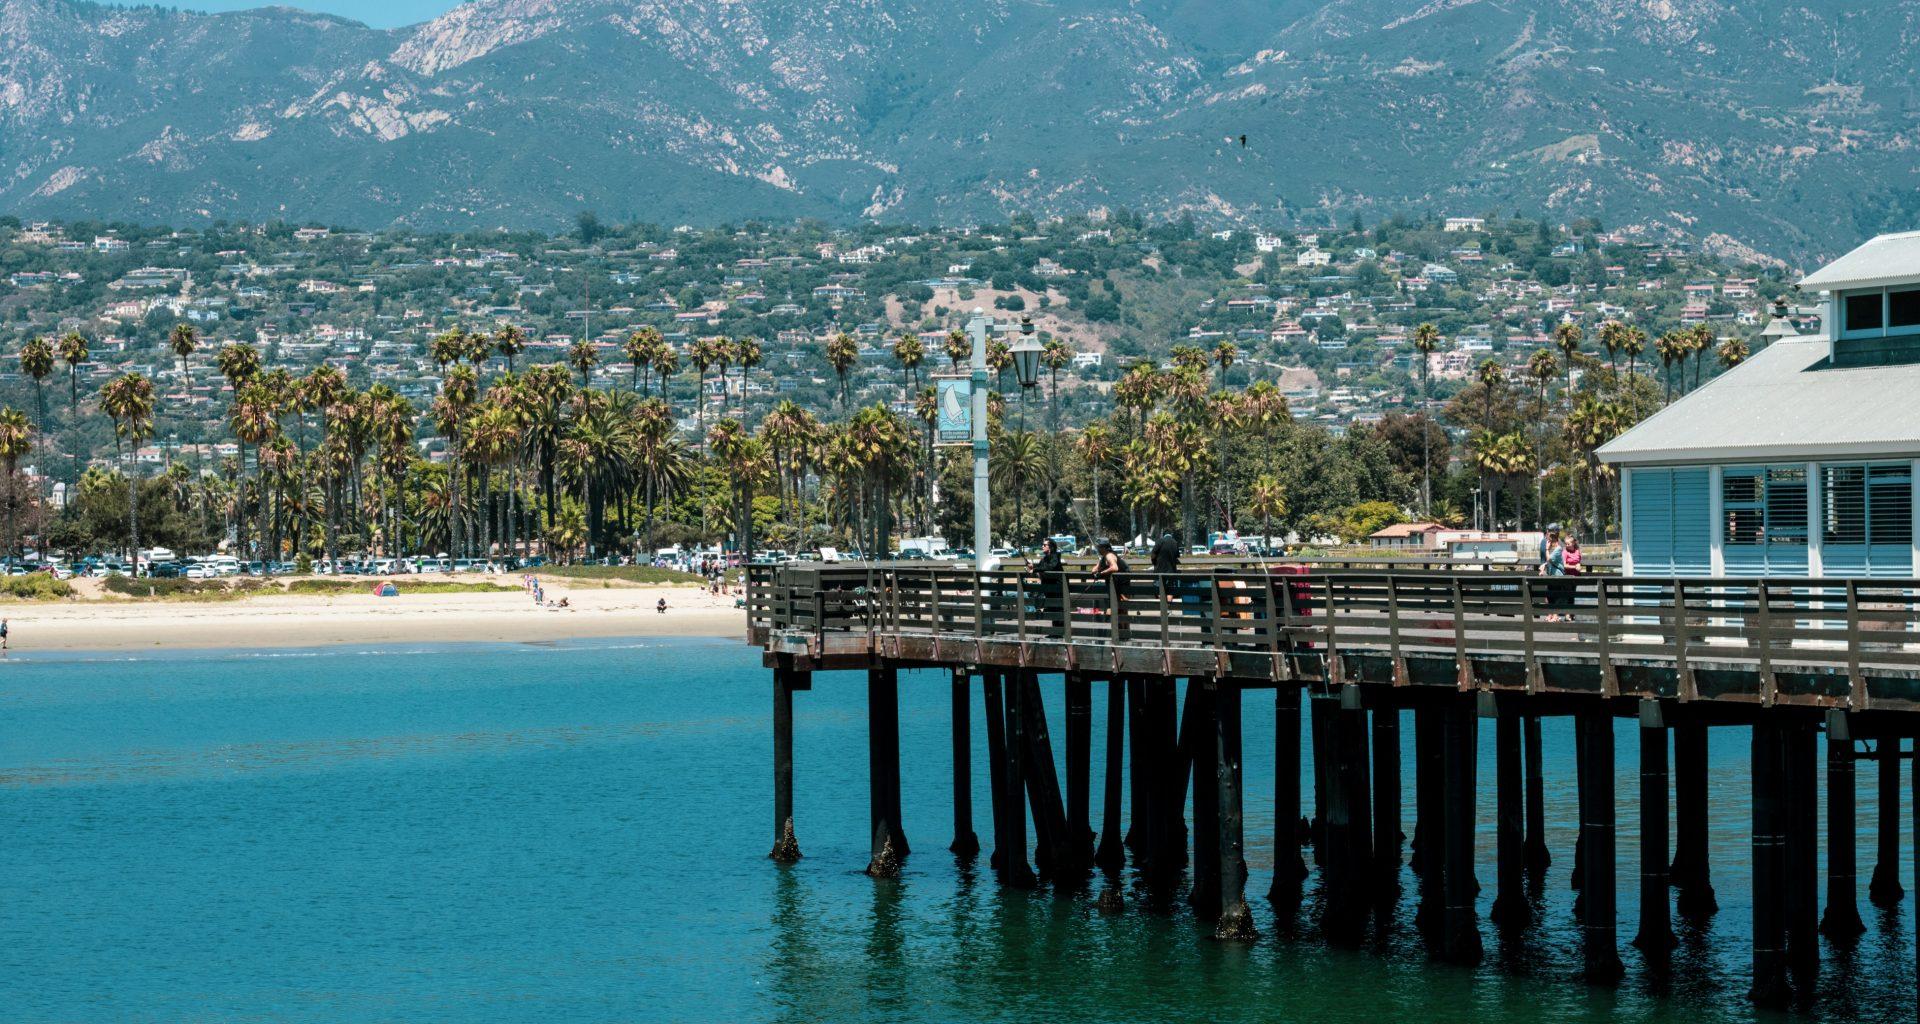 Luxurious Hotels In Santa Barbara